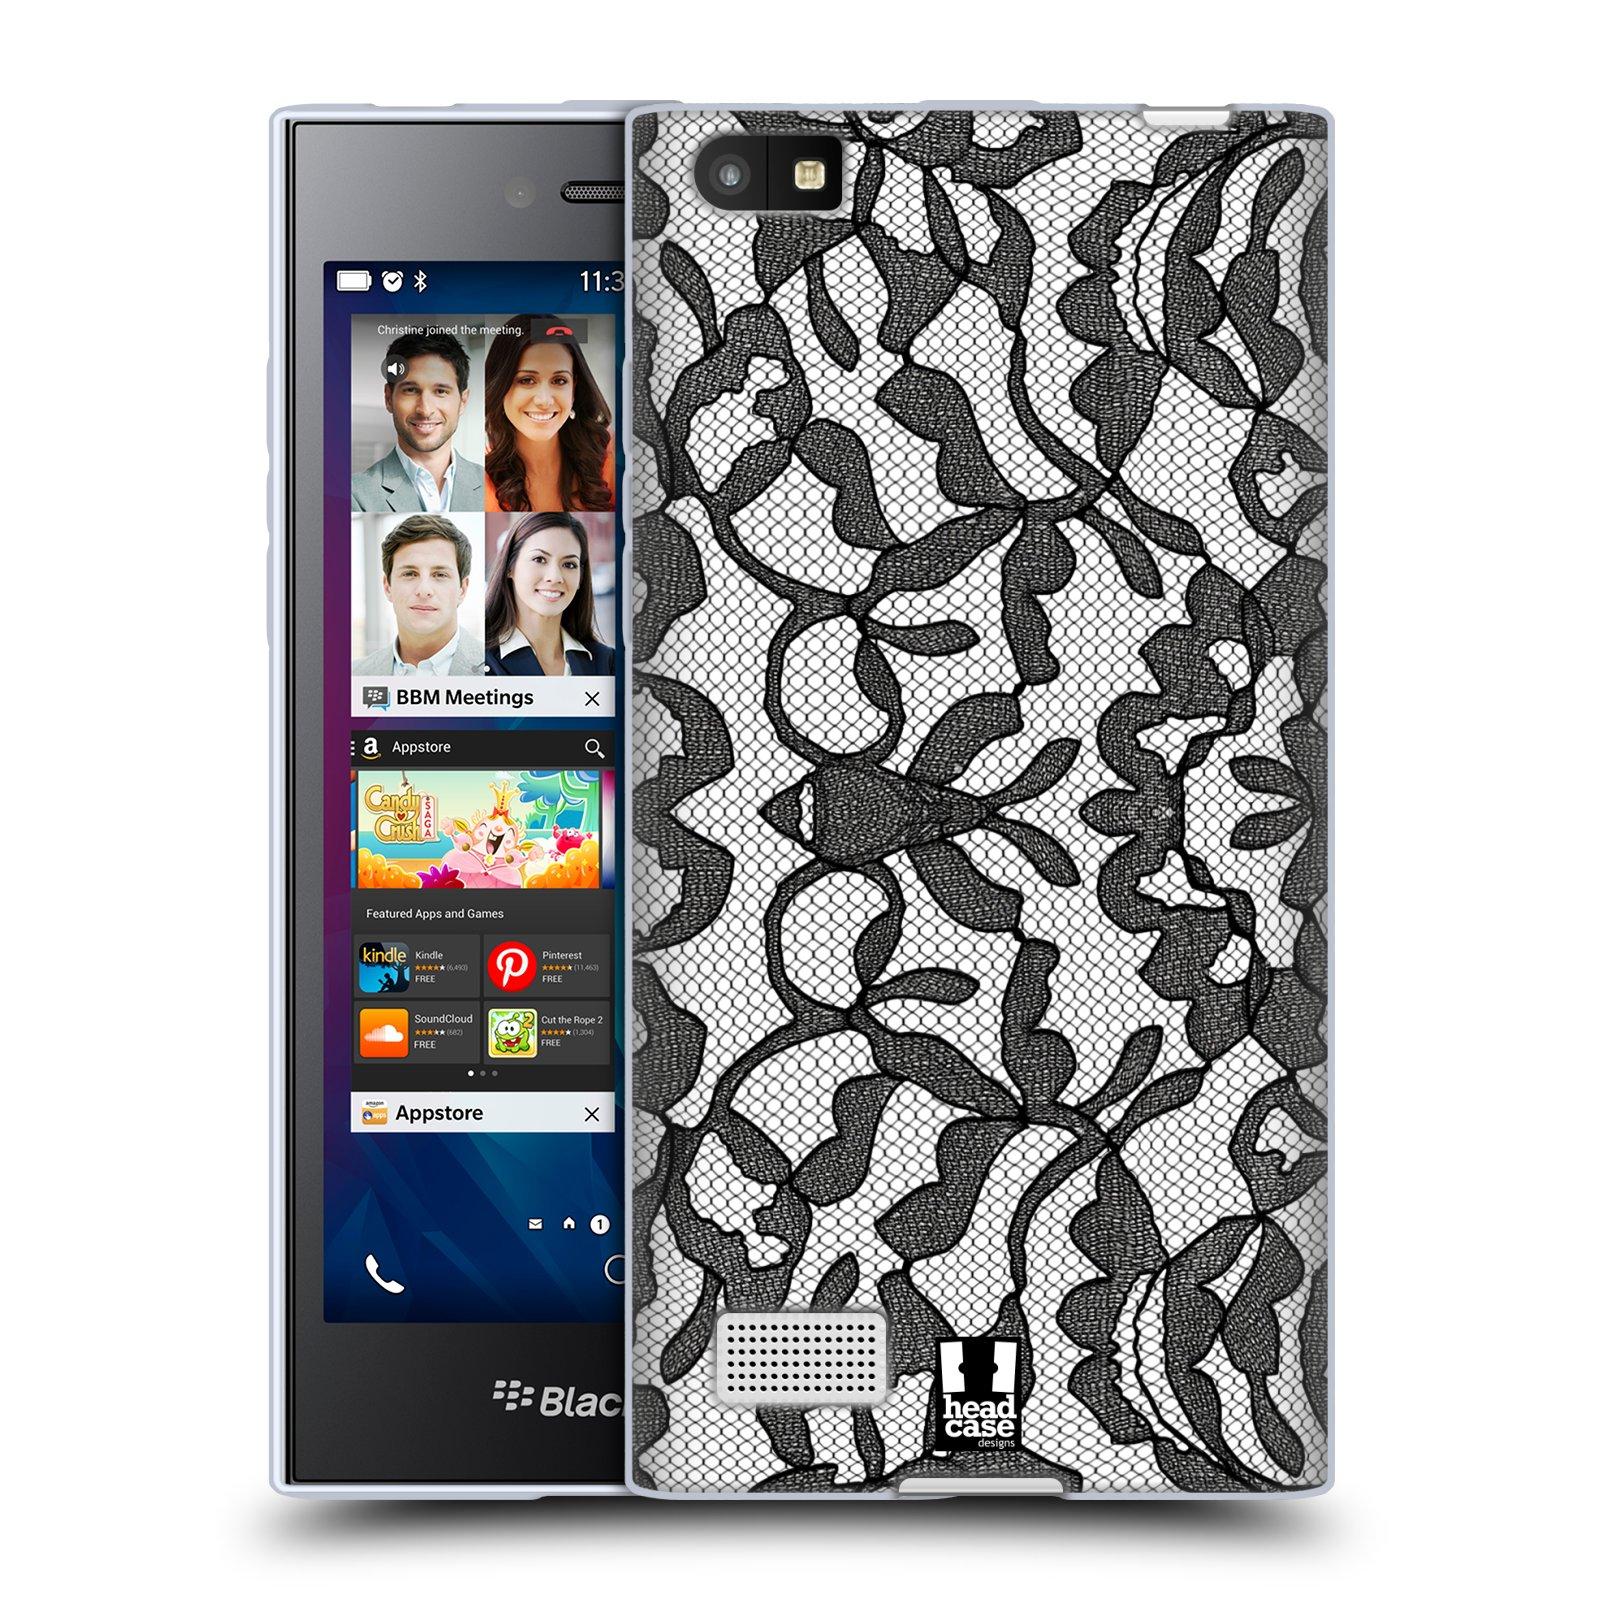 Silikonové pouzdro na mobil Blackberry Leap HEAD CASE LEAFY KRAJKA (Silikonový kryt či obal na mobilní telefon Blackberry Leap)